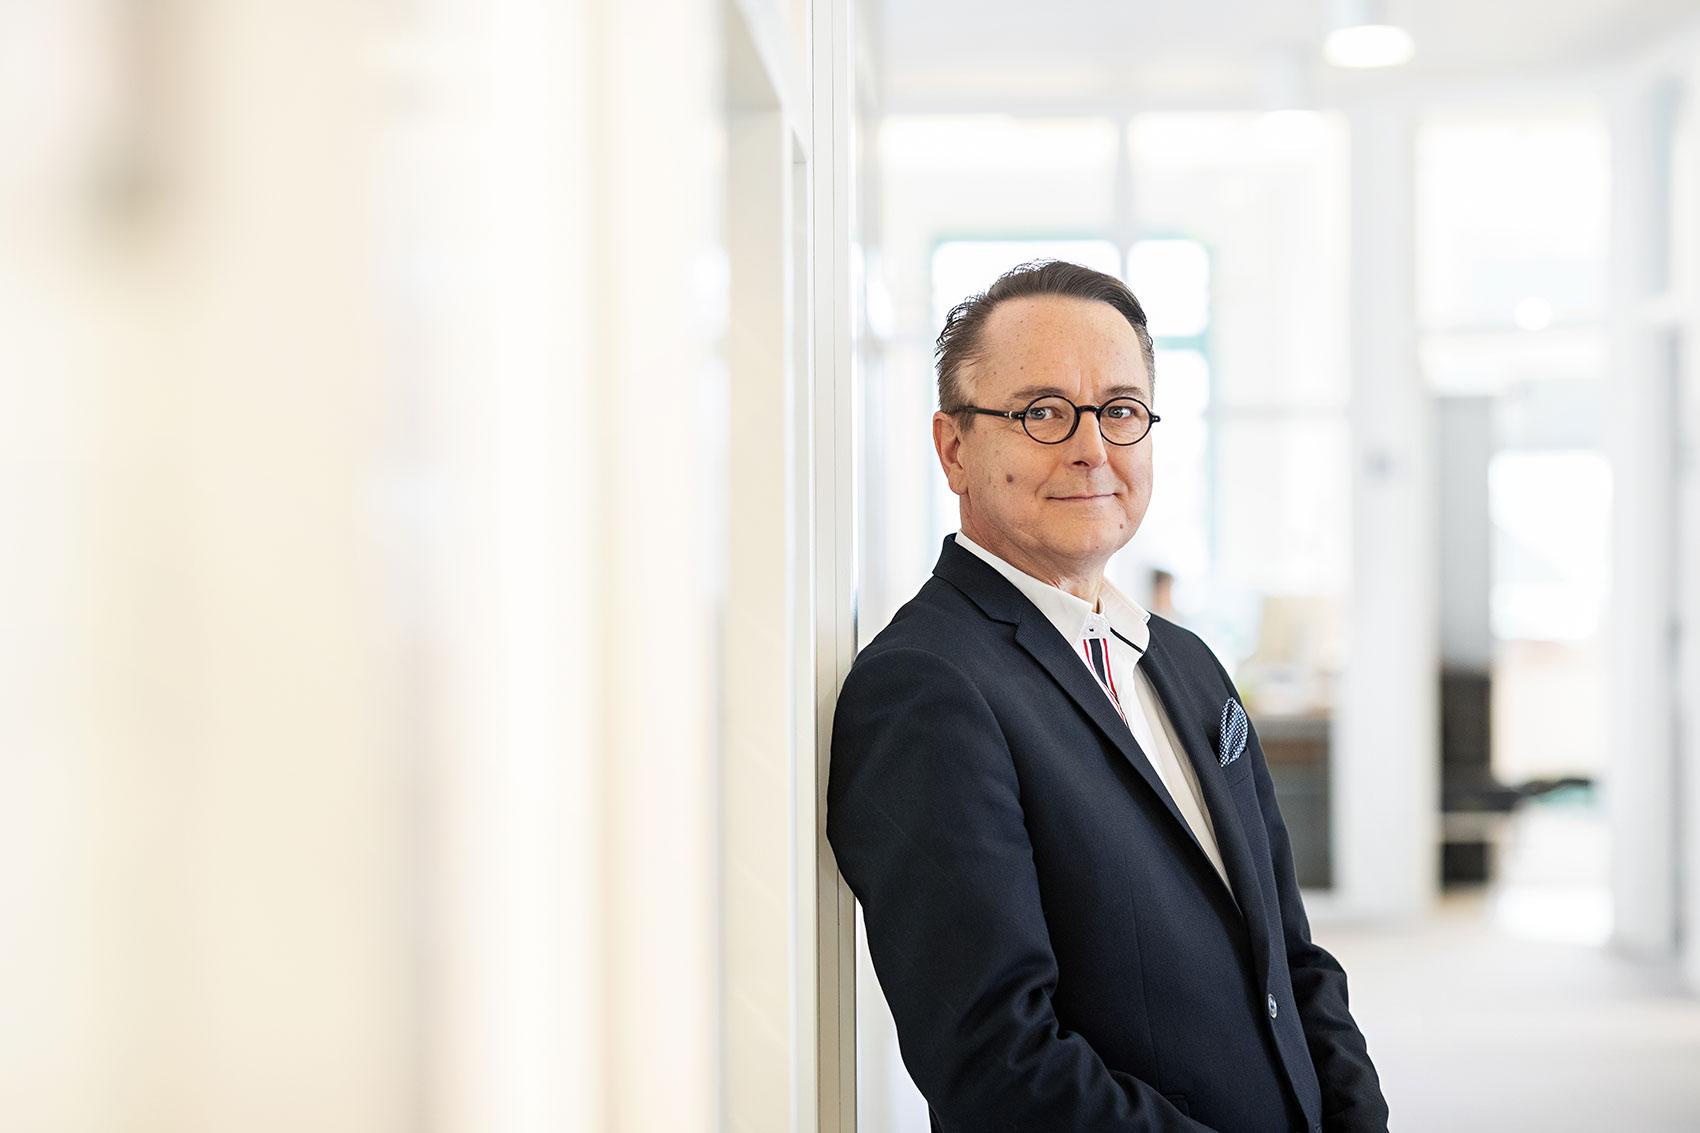 Patrick Baars, Director Area Management Business Unit Healthcare